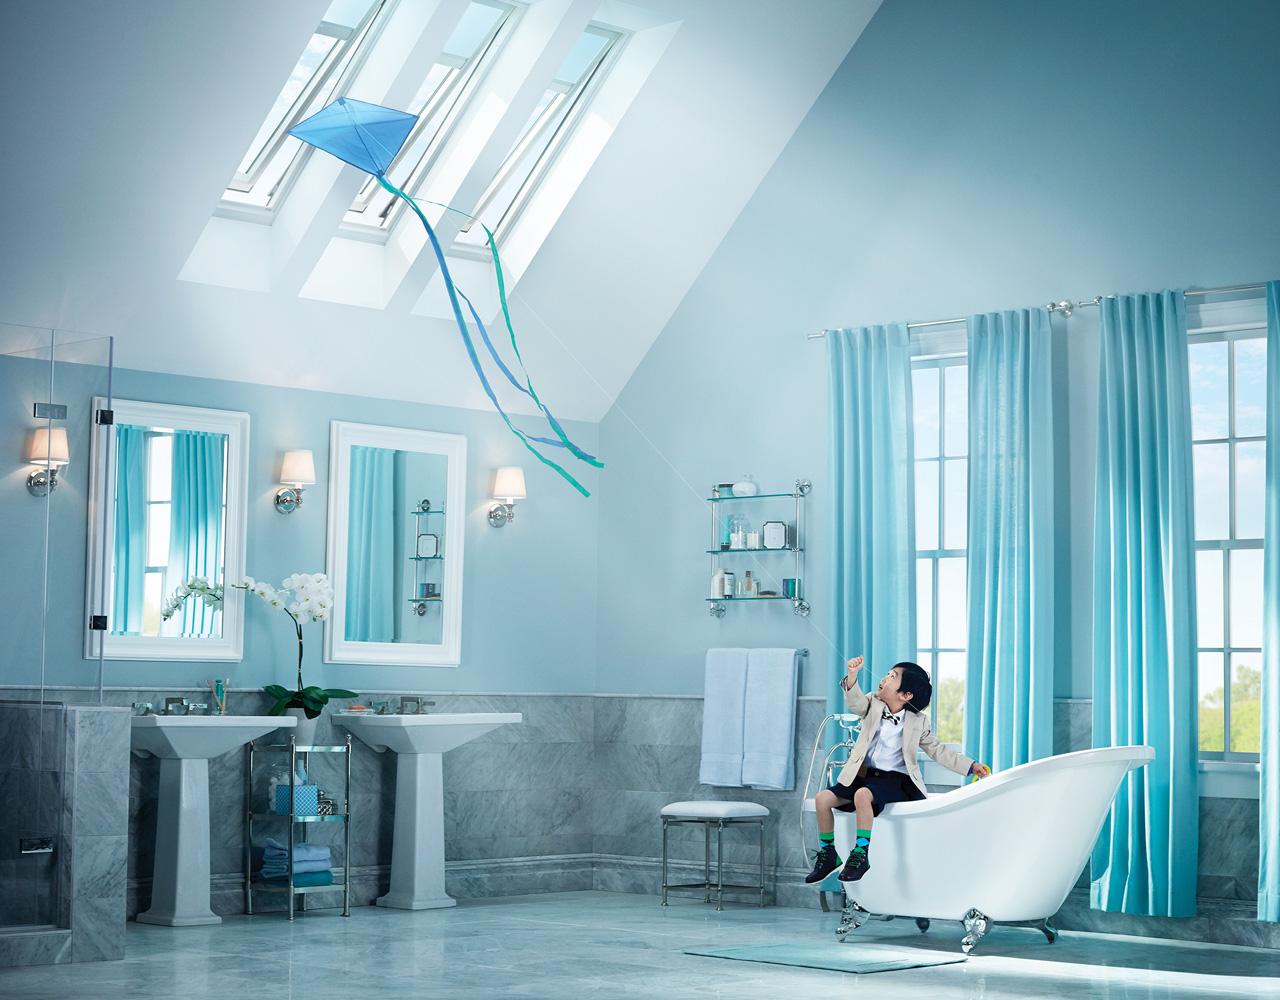 VELUX Bathroom Inspiration Gallery of Images – Skylight in Bathroom